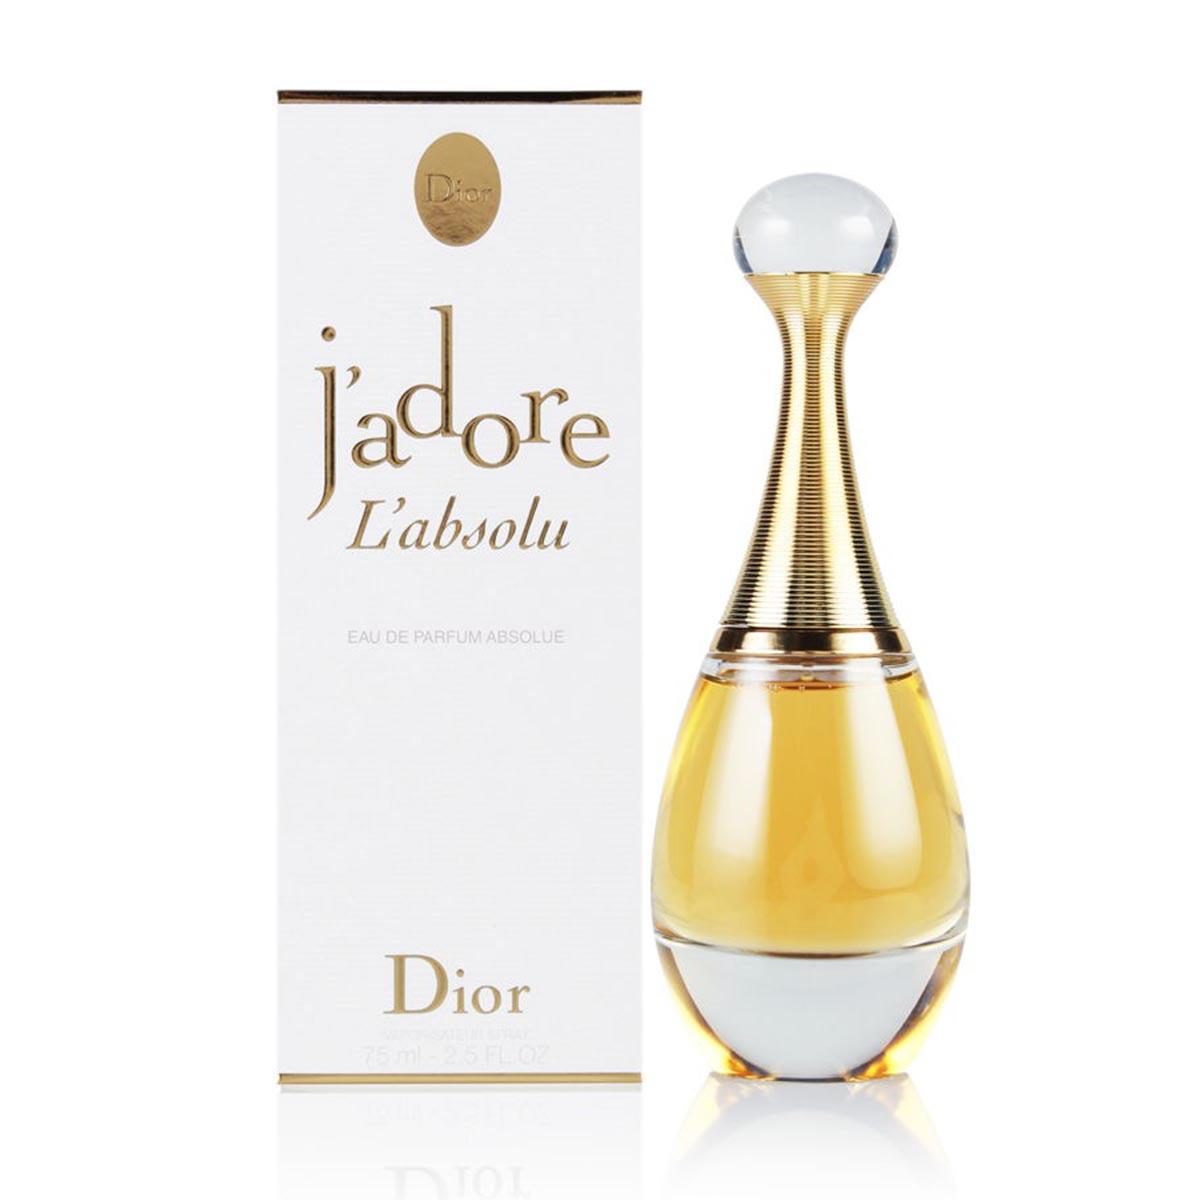 Dior j adore l absolu eau de parfum 75ml vaporizador